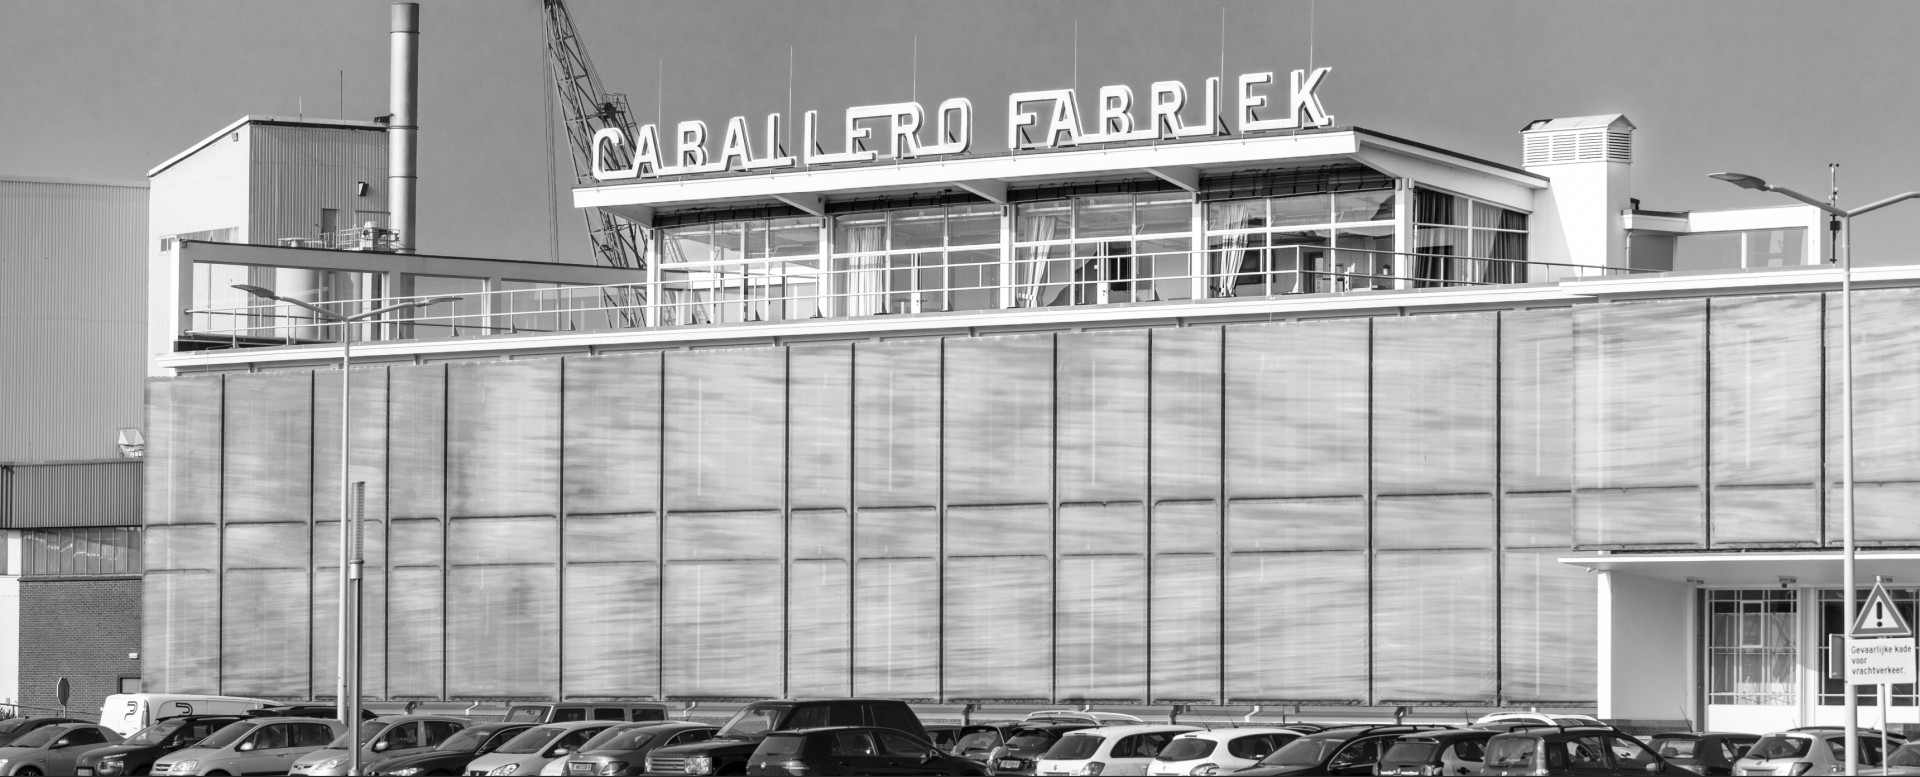 Caballero Fabriek